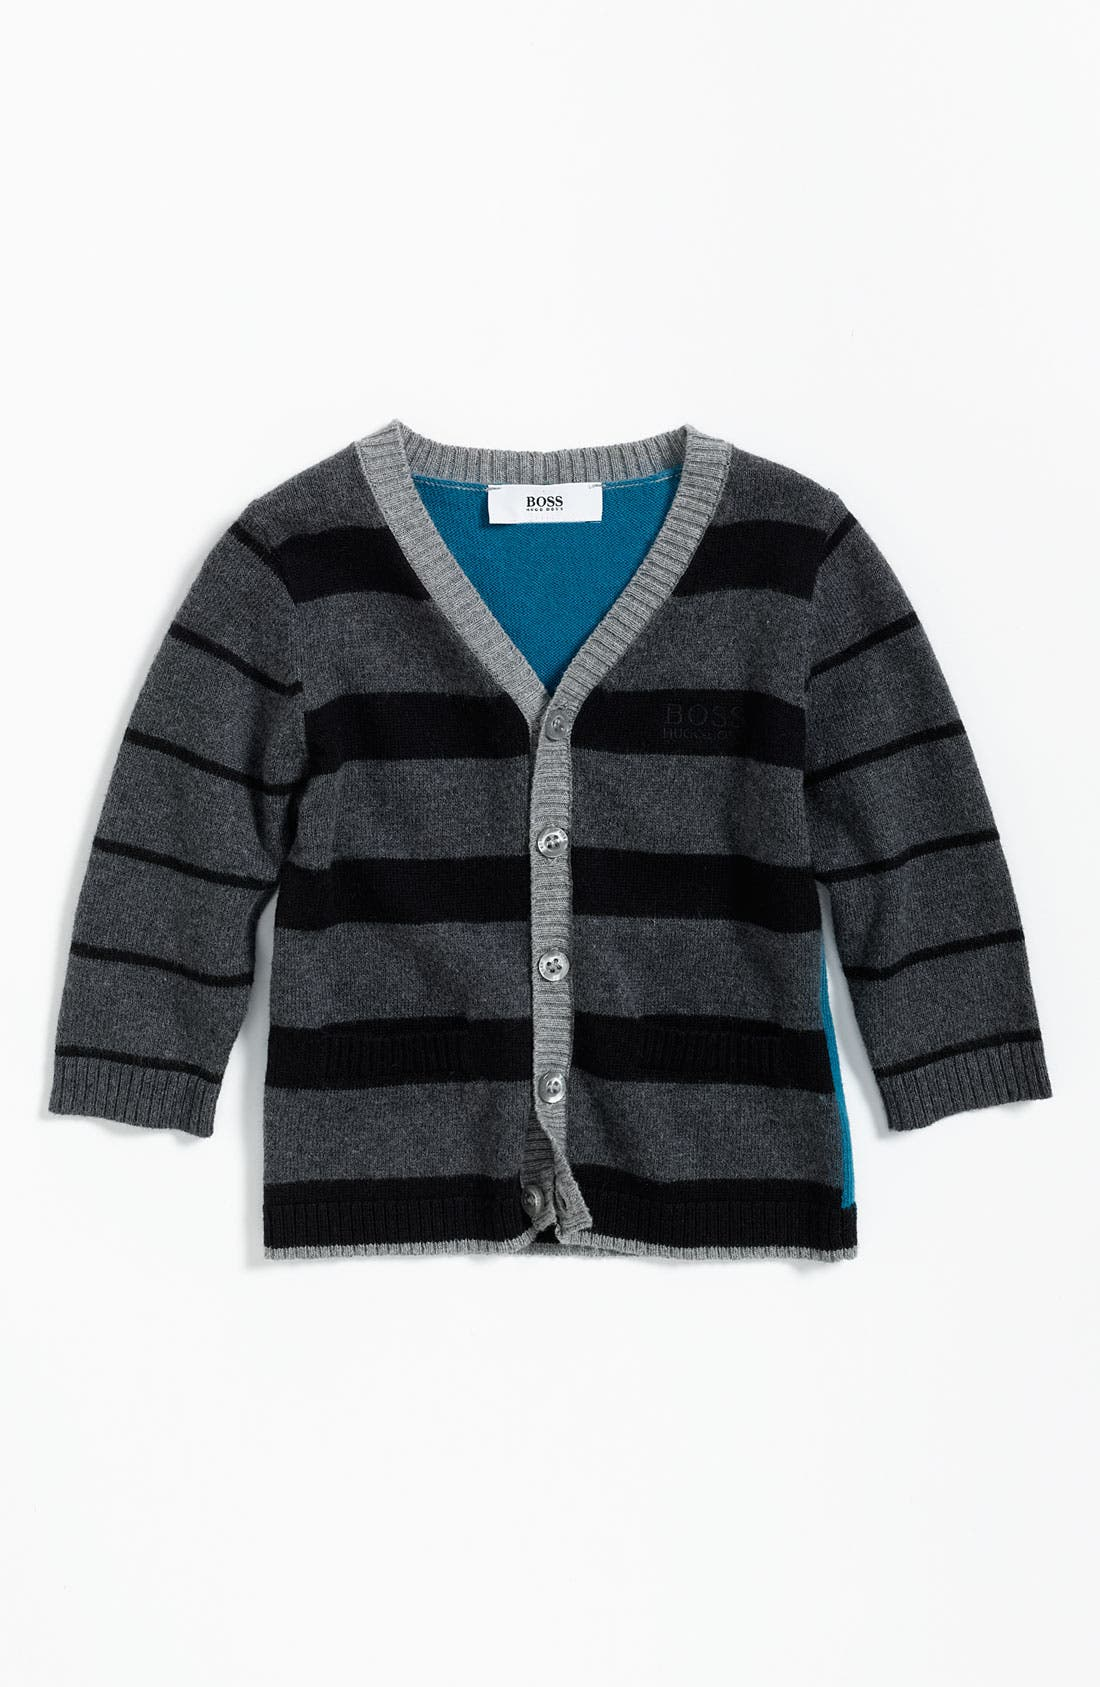 Main Image - BOSS Kidswear Stripe Cardigan (Infant)